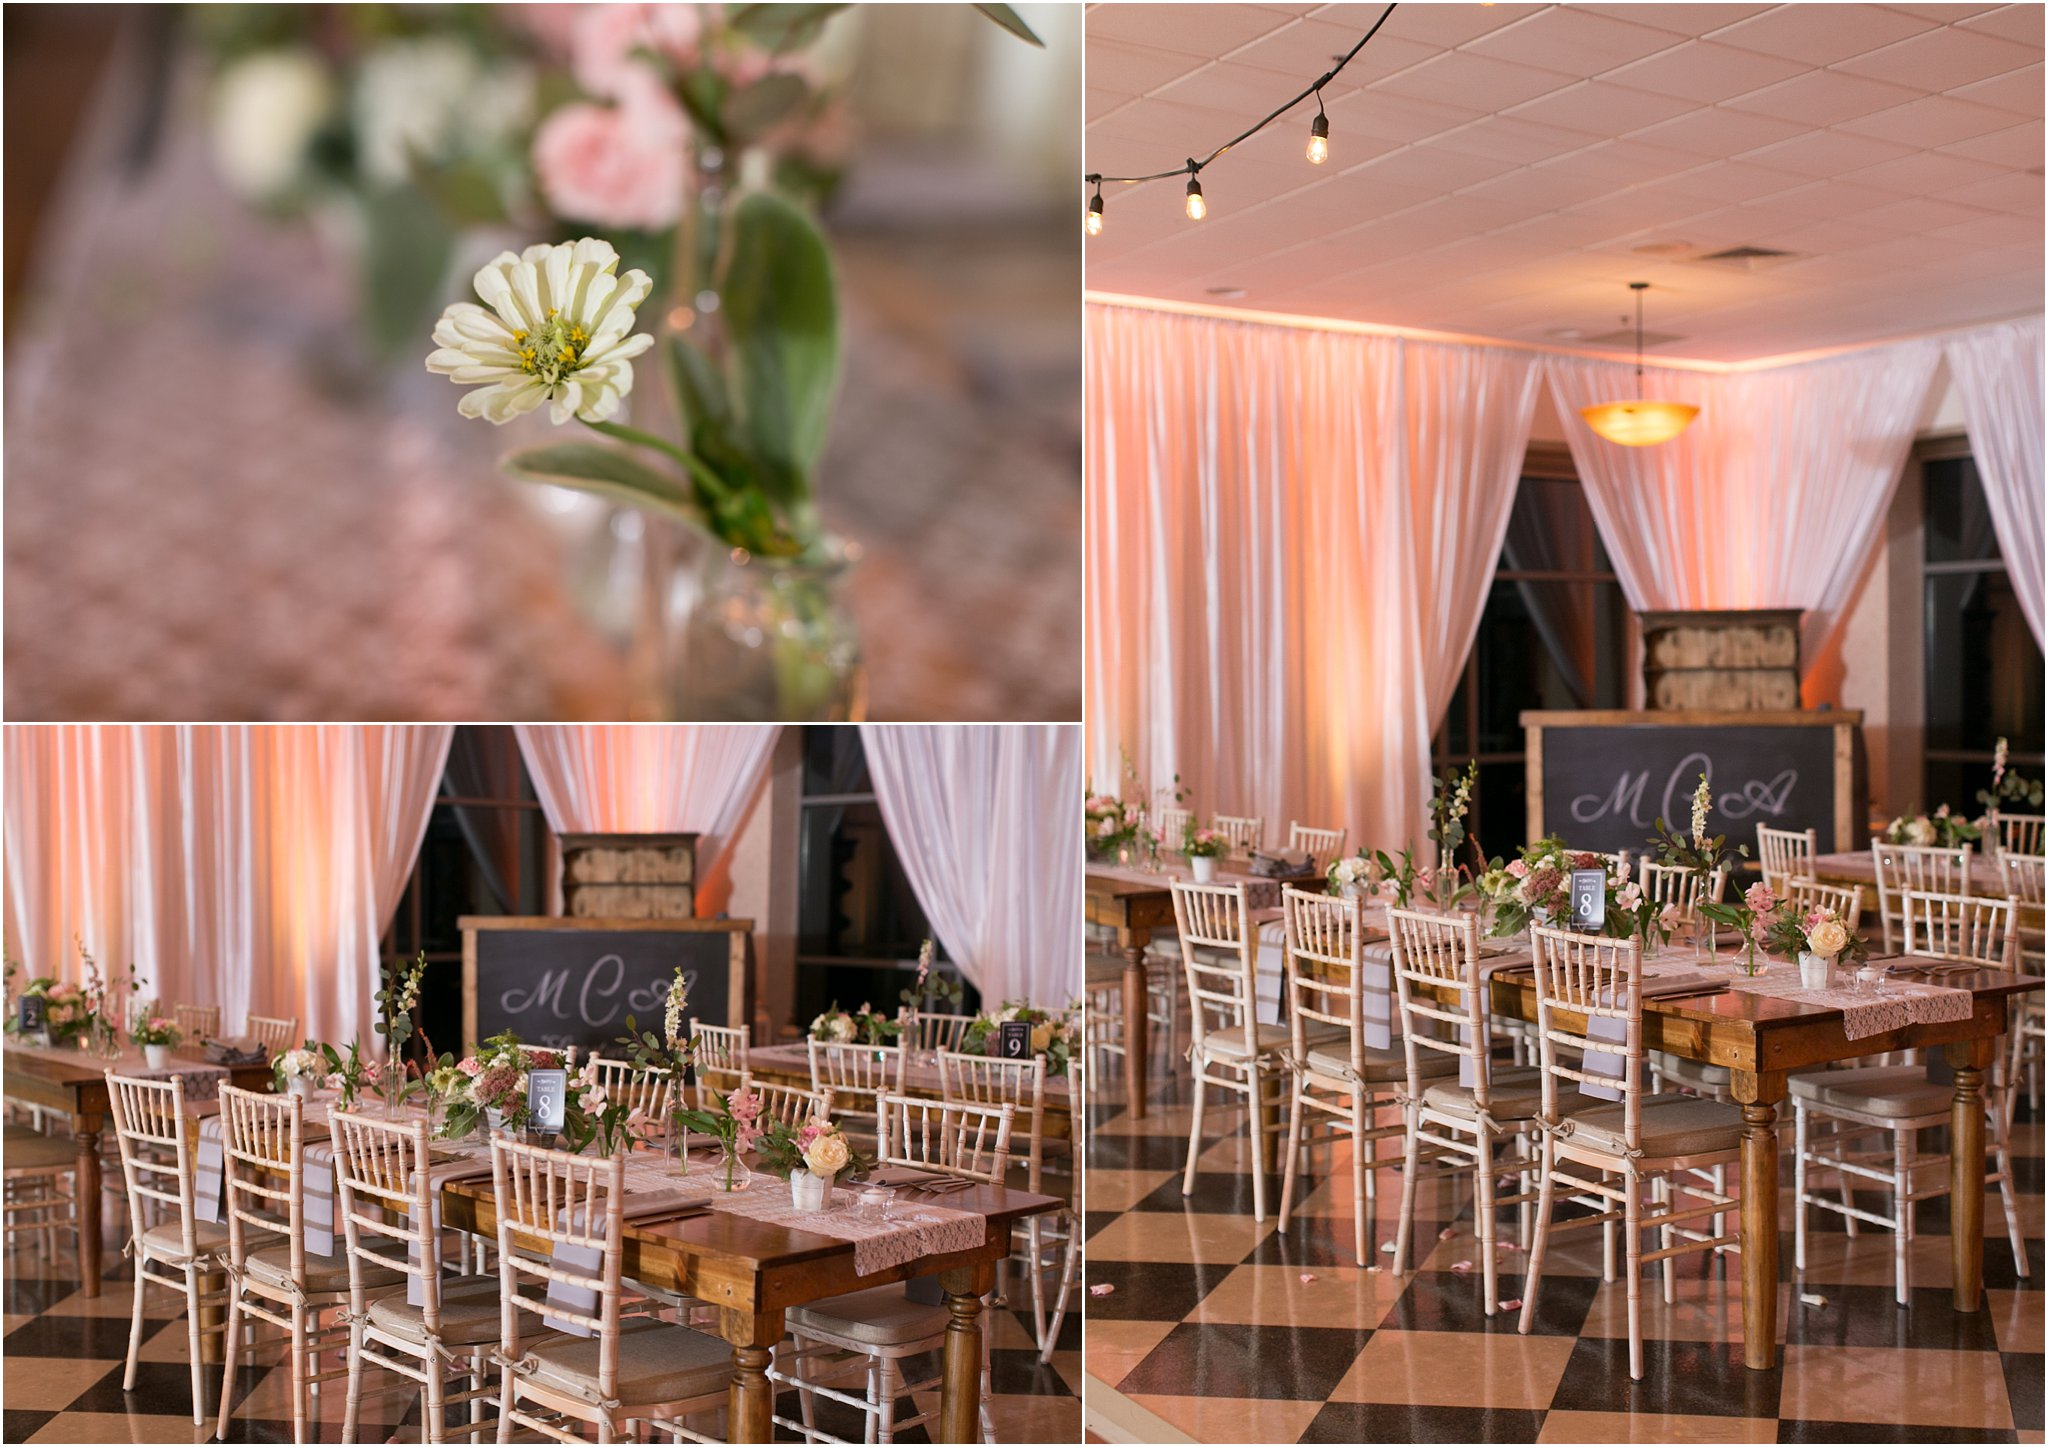 jessica_ryan_photography_virginia_wedding_photographer_wedding_hurricane_norfolk_botanical_gardens_hurricane_matthew_wedding_3611